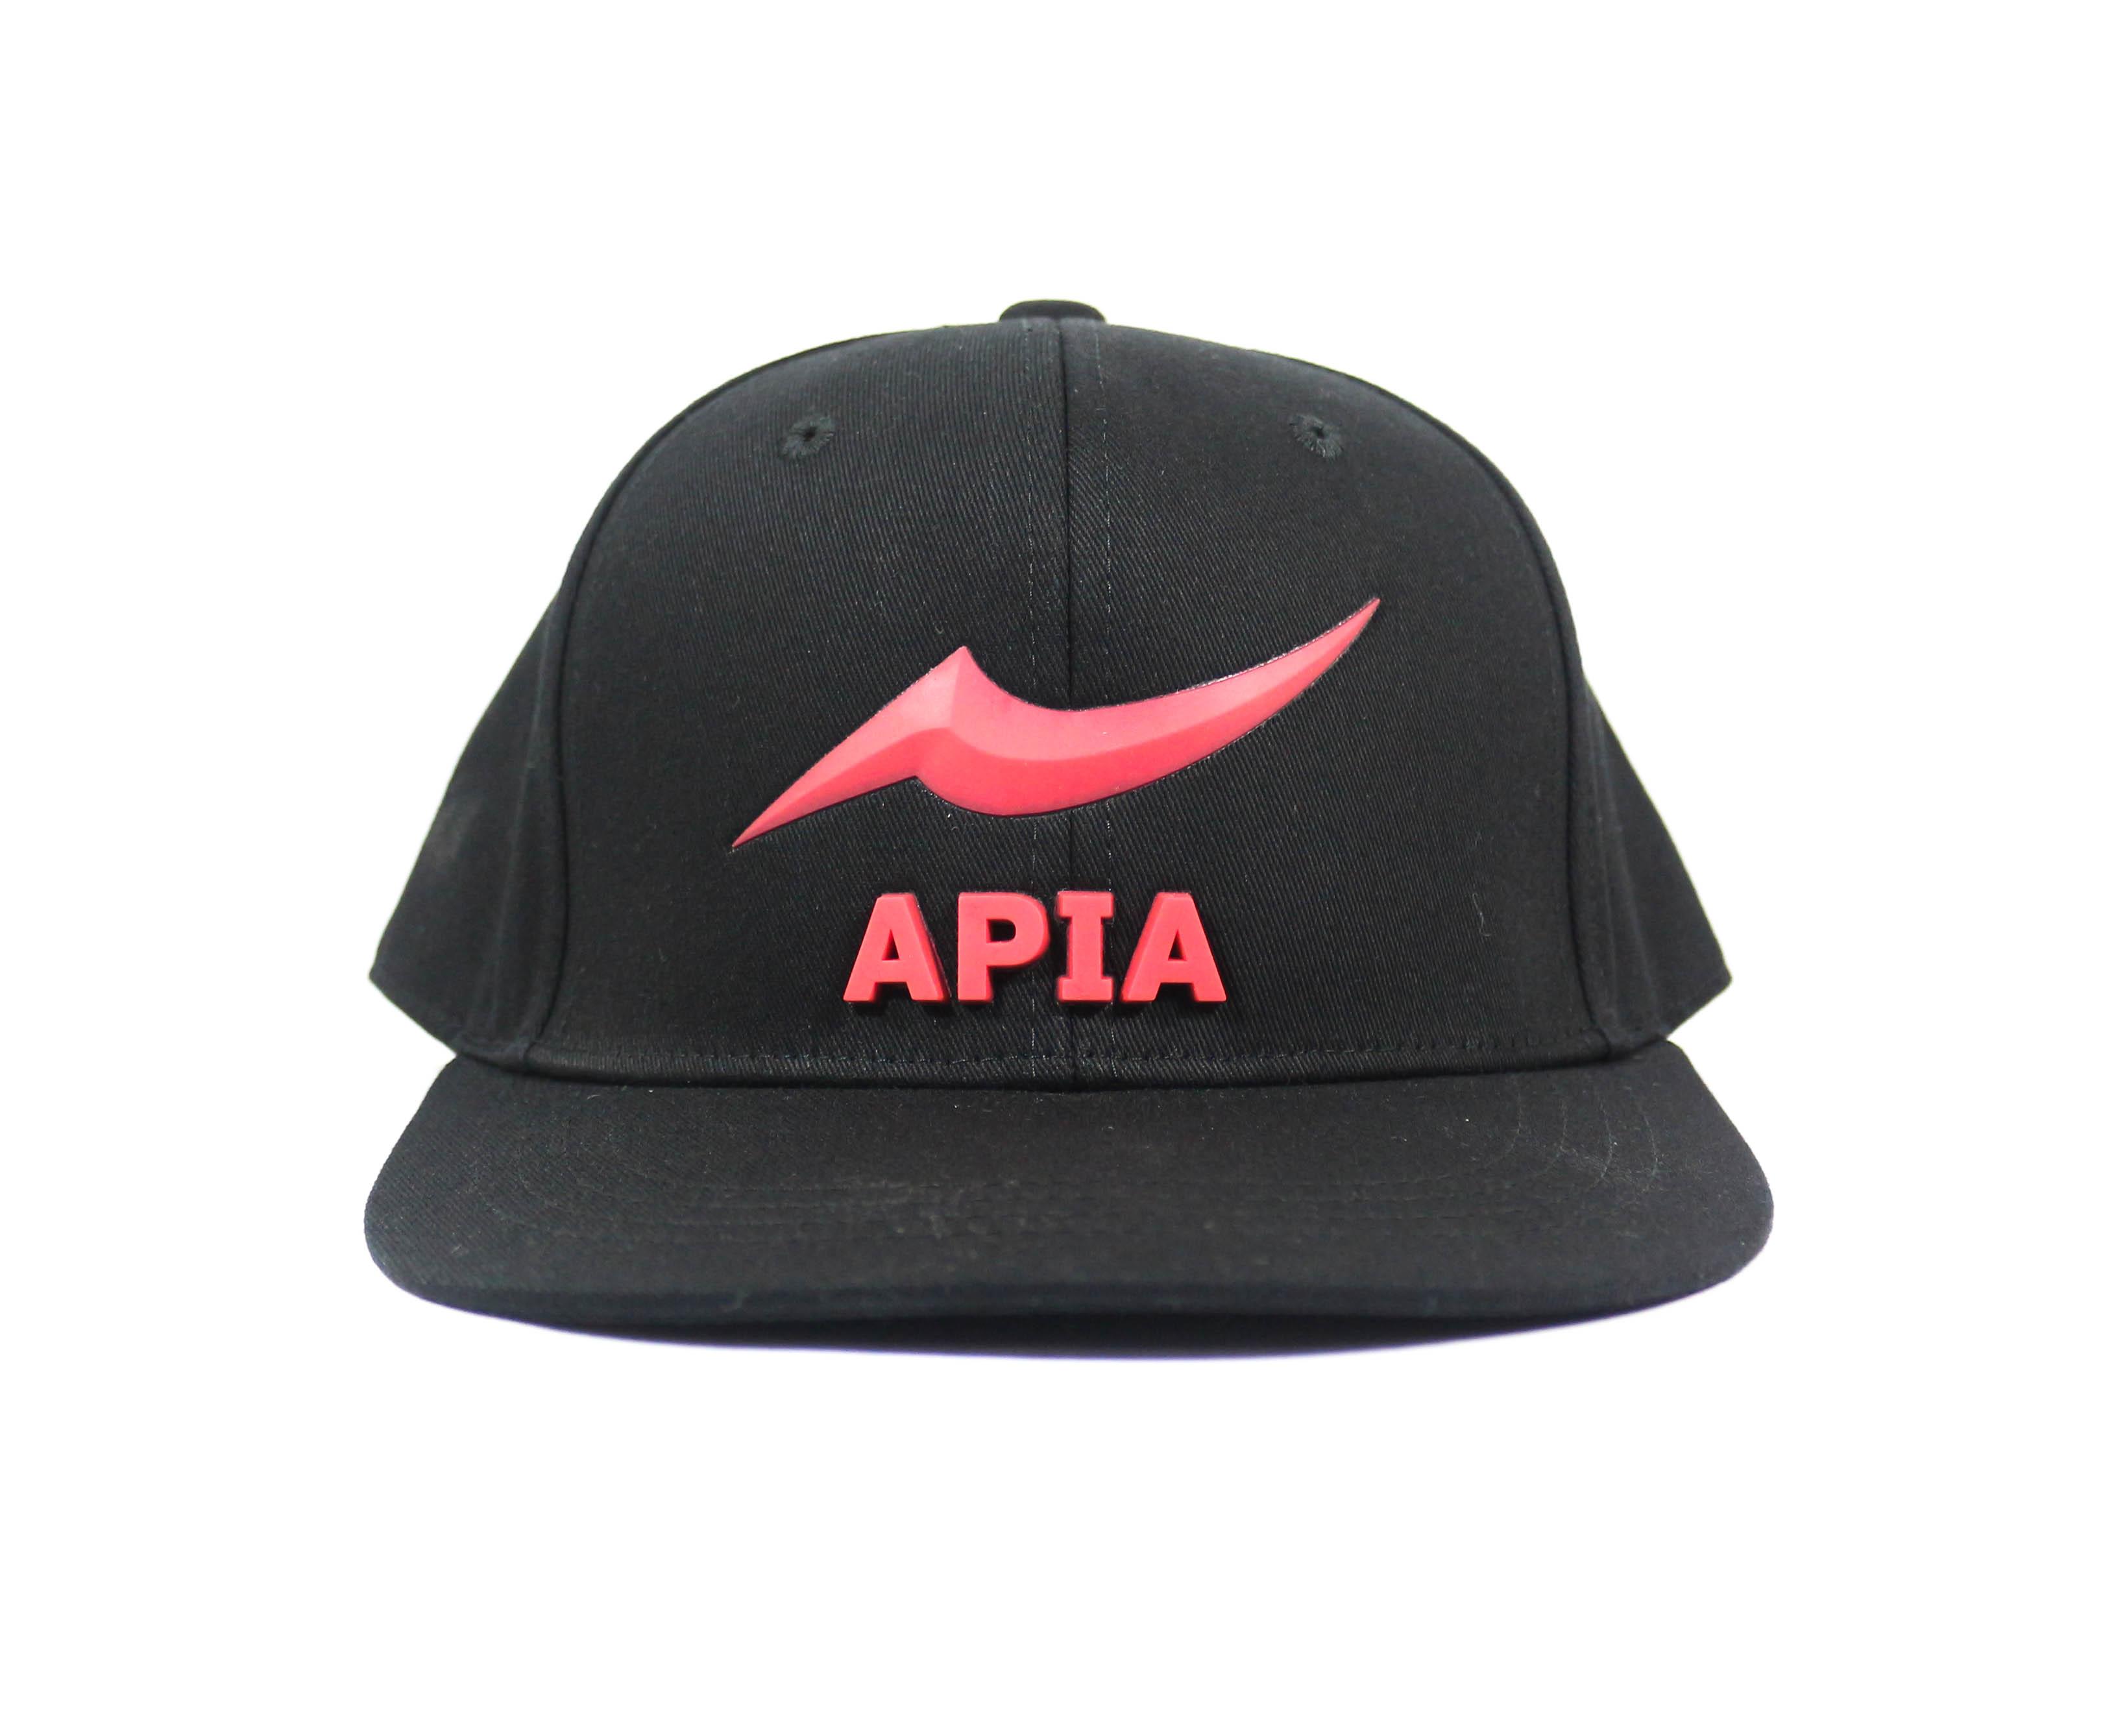 Apia Cap HF Flat-Cap Free Size Black Red (9273)